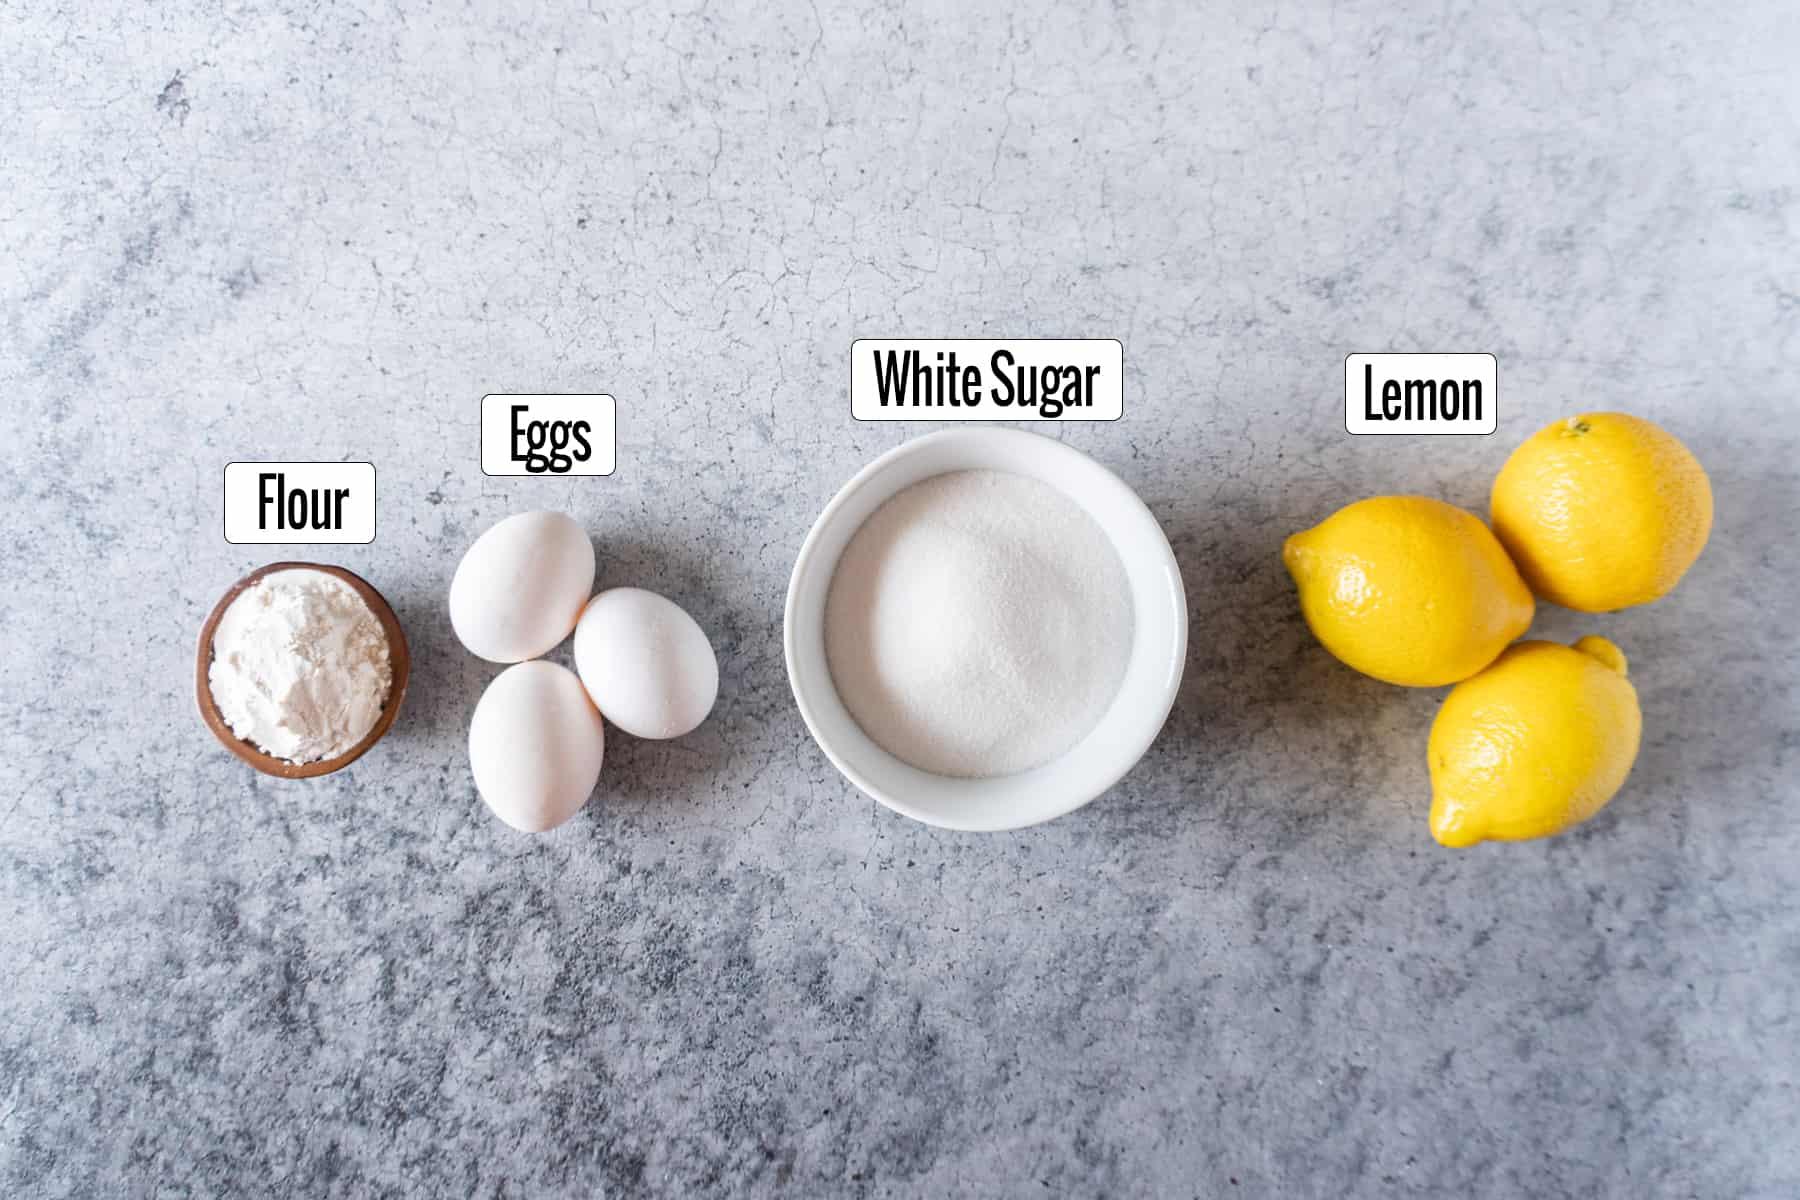 lemon bars ingredients- flour, eggs, sugar, lemons